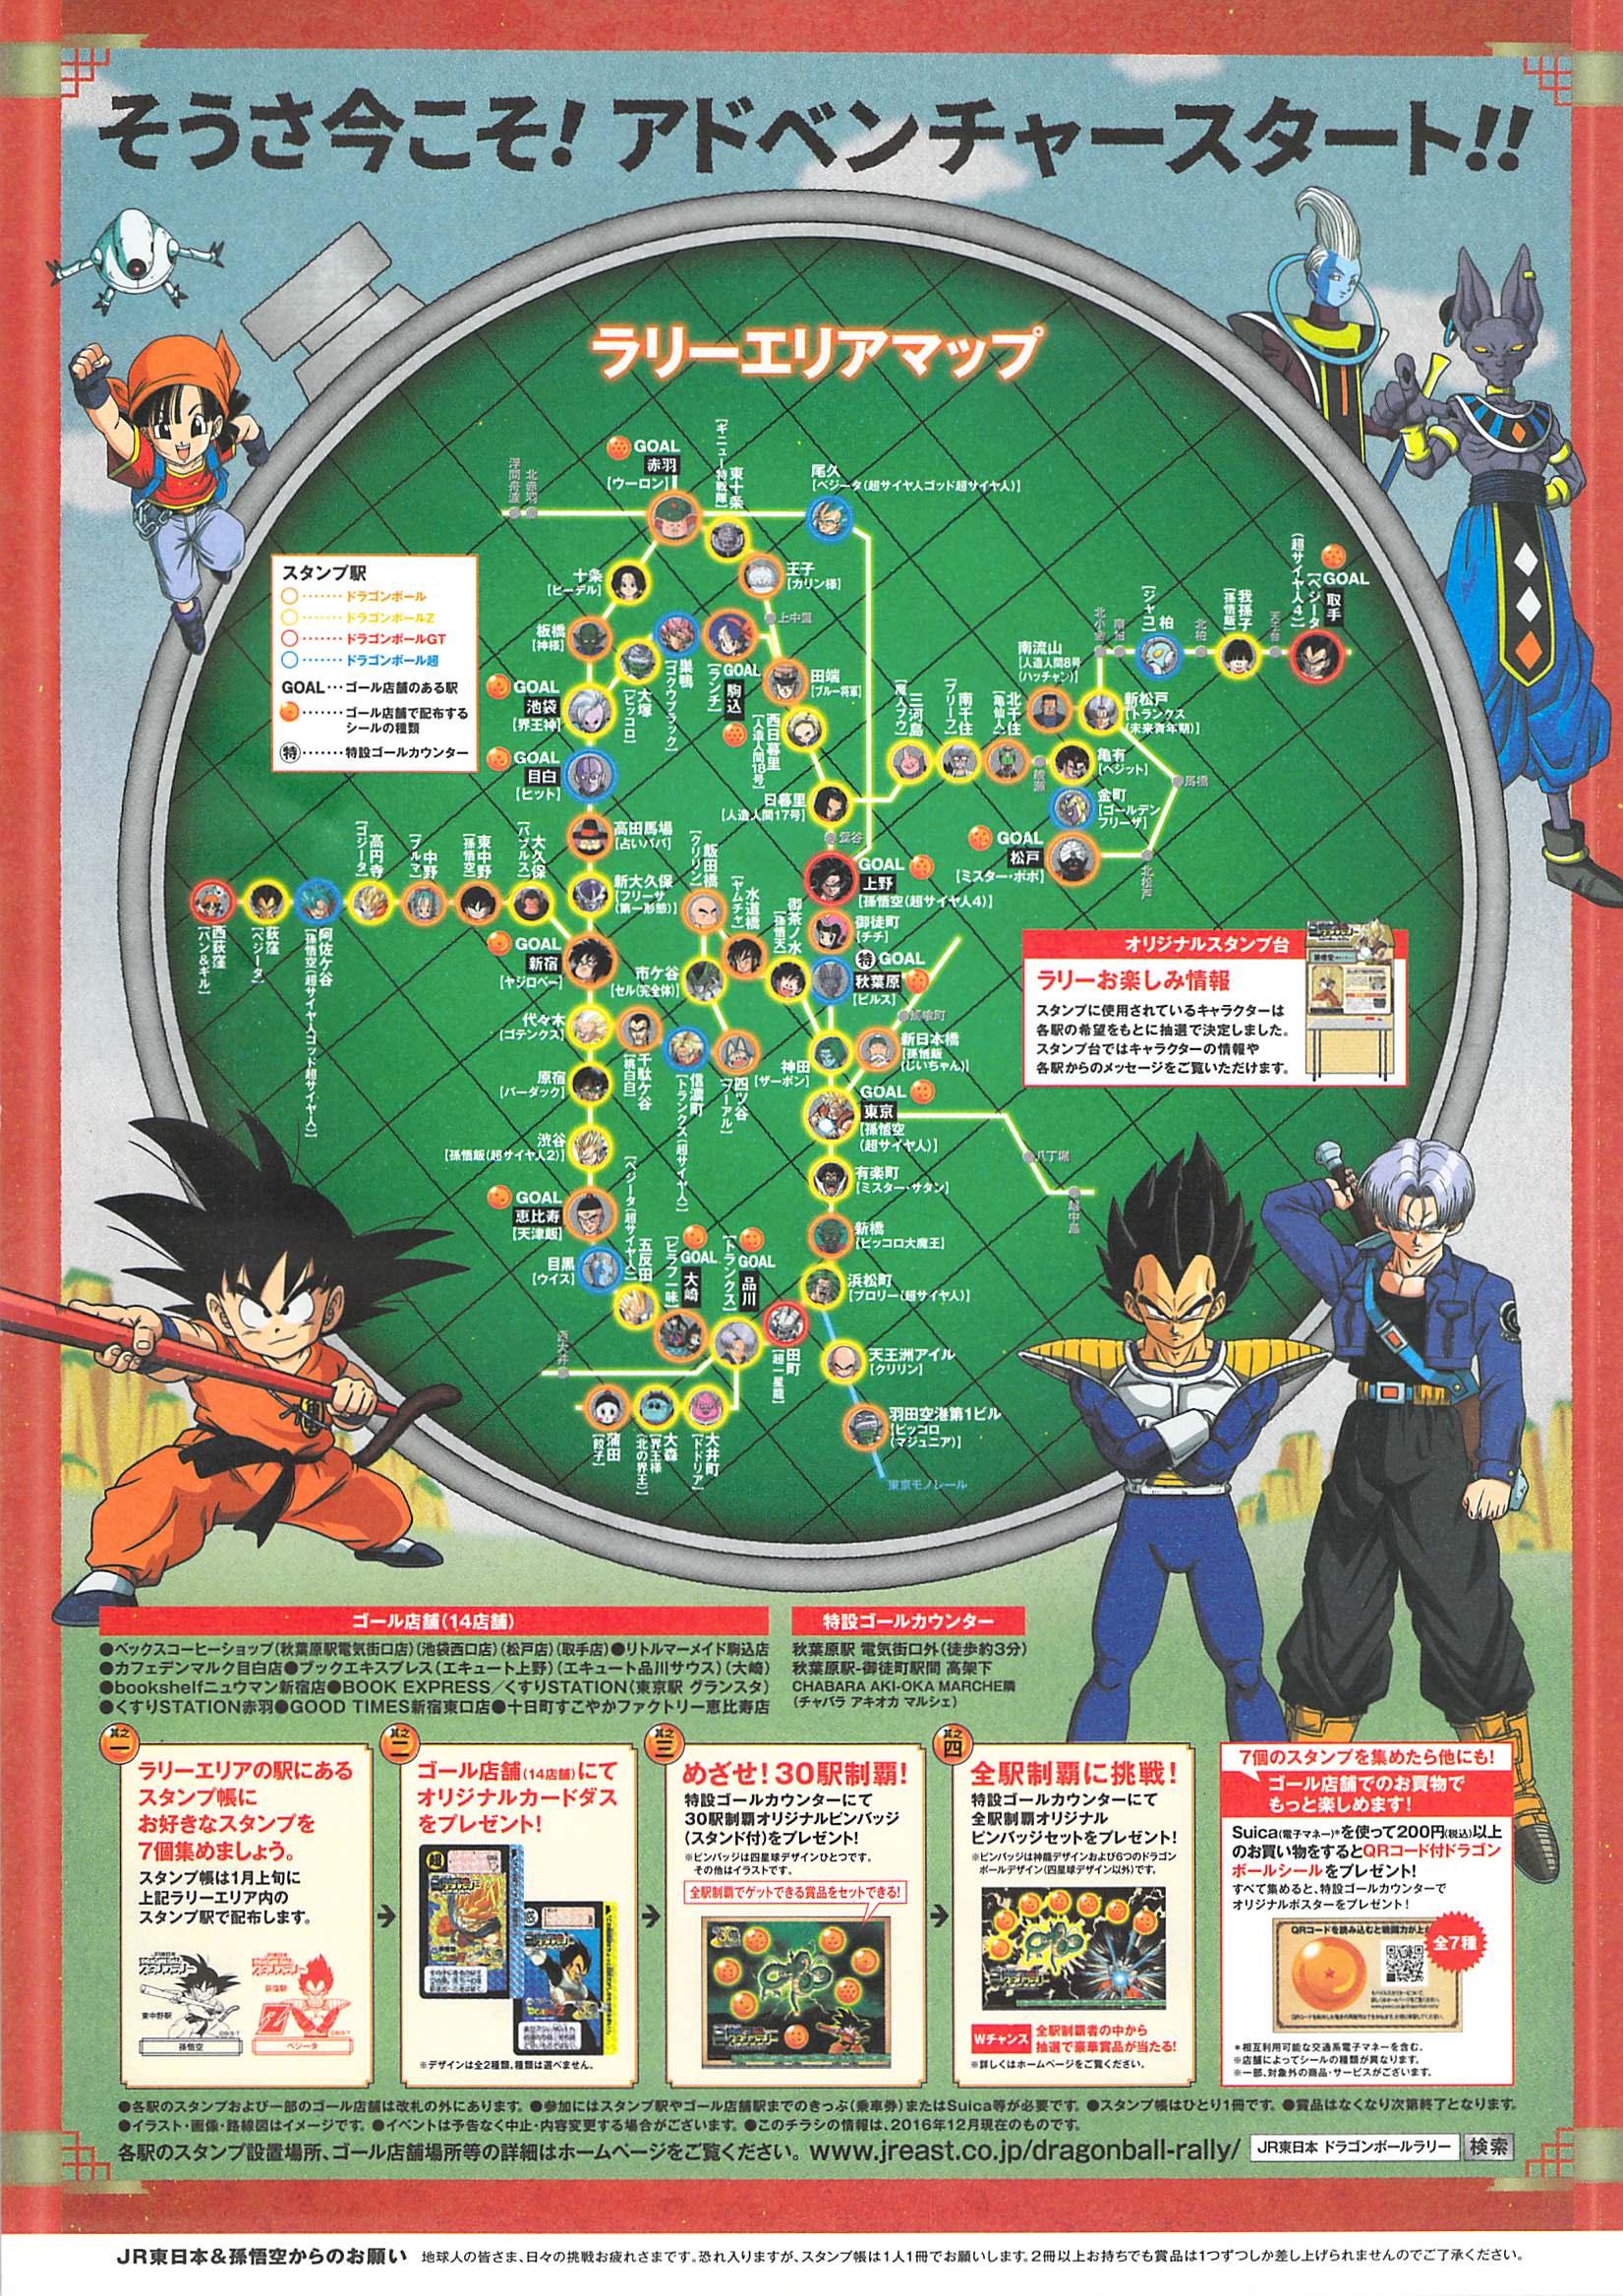 JR東日本のスタンプラリー、2017年はドラゴンボールがテーマ